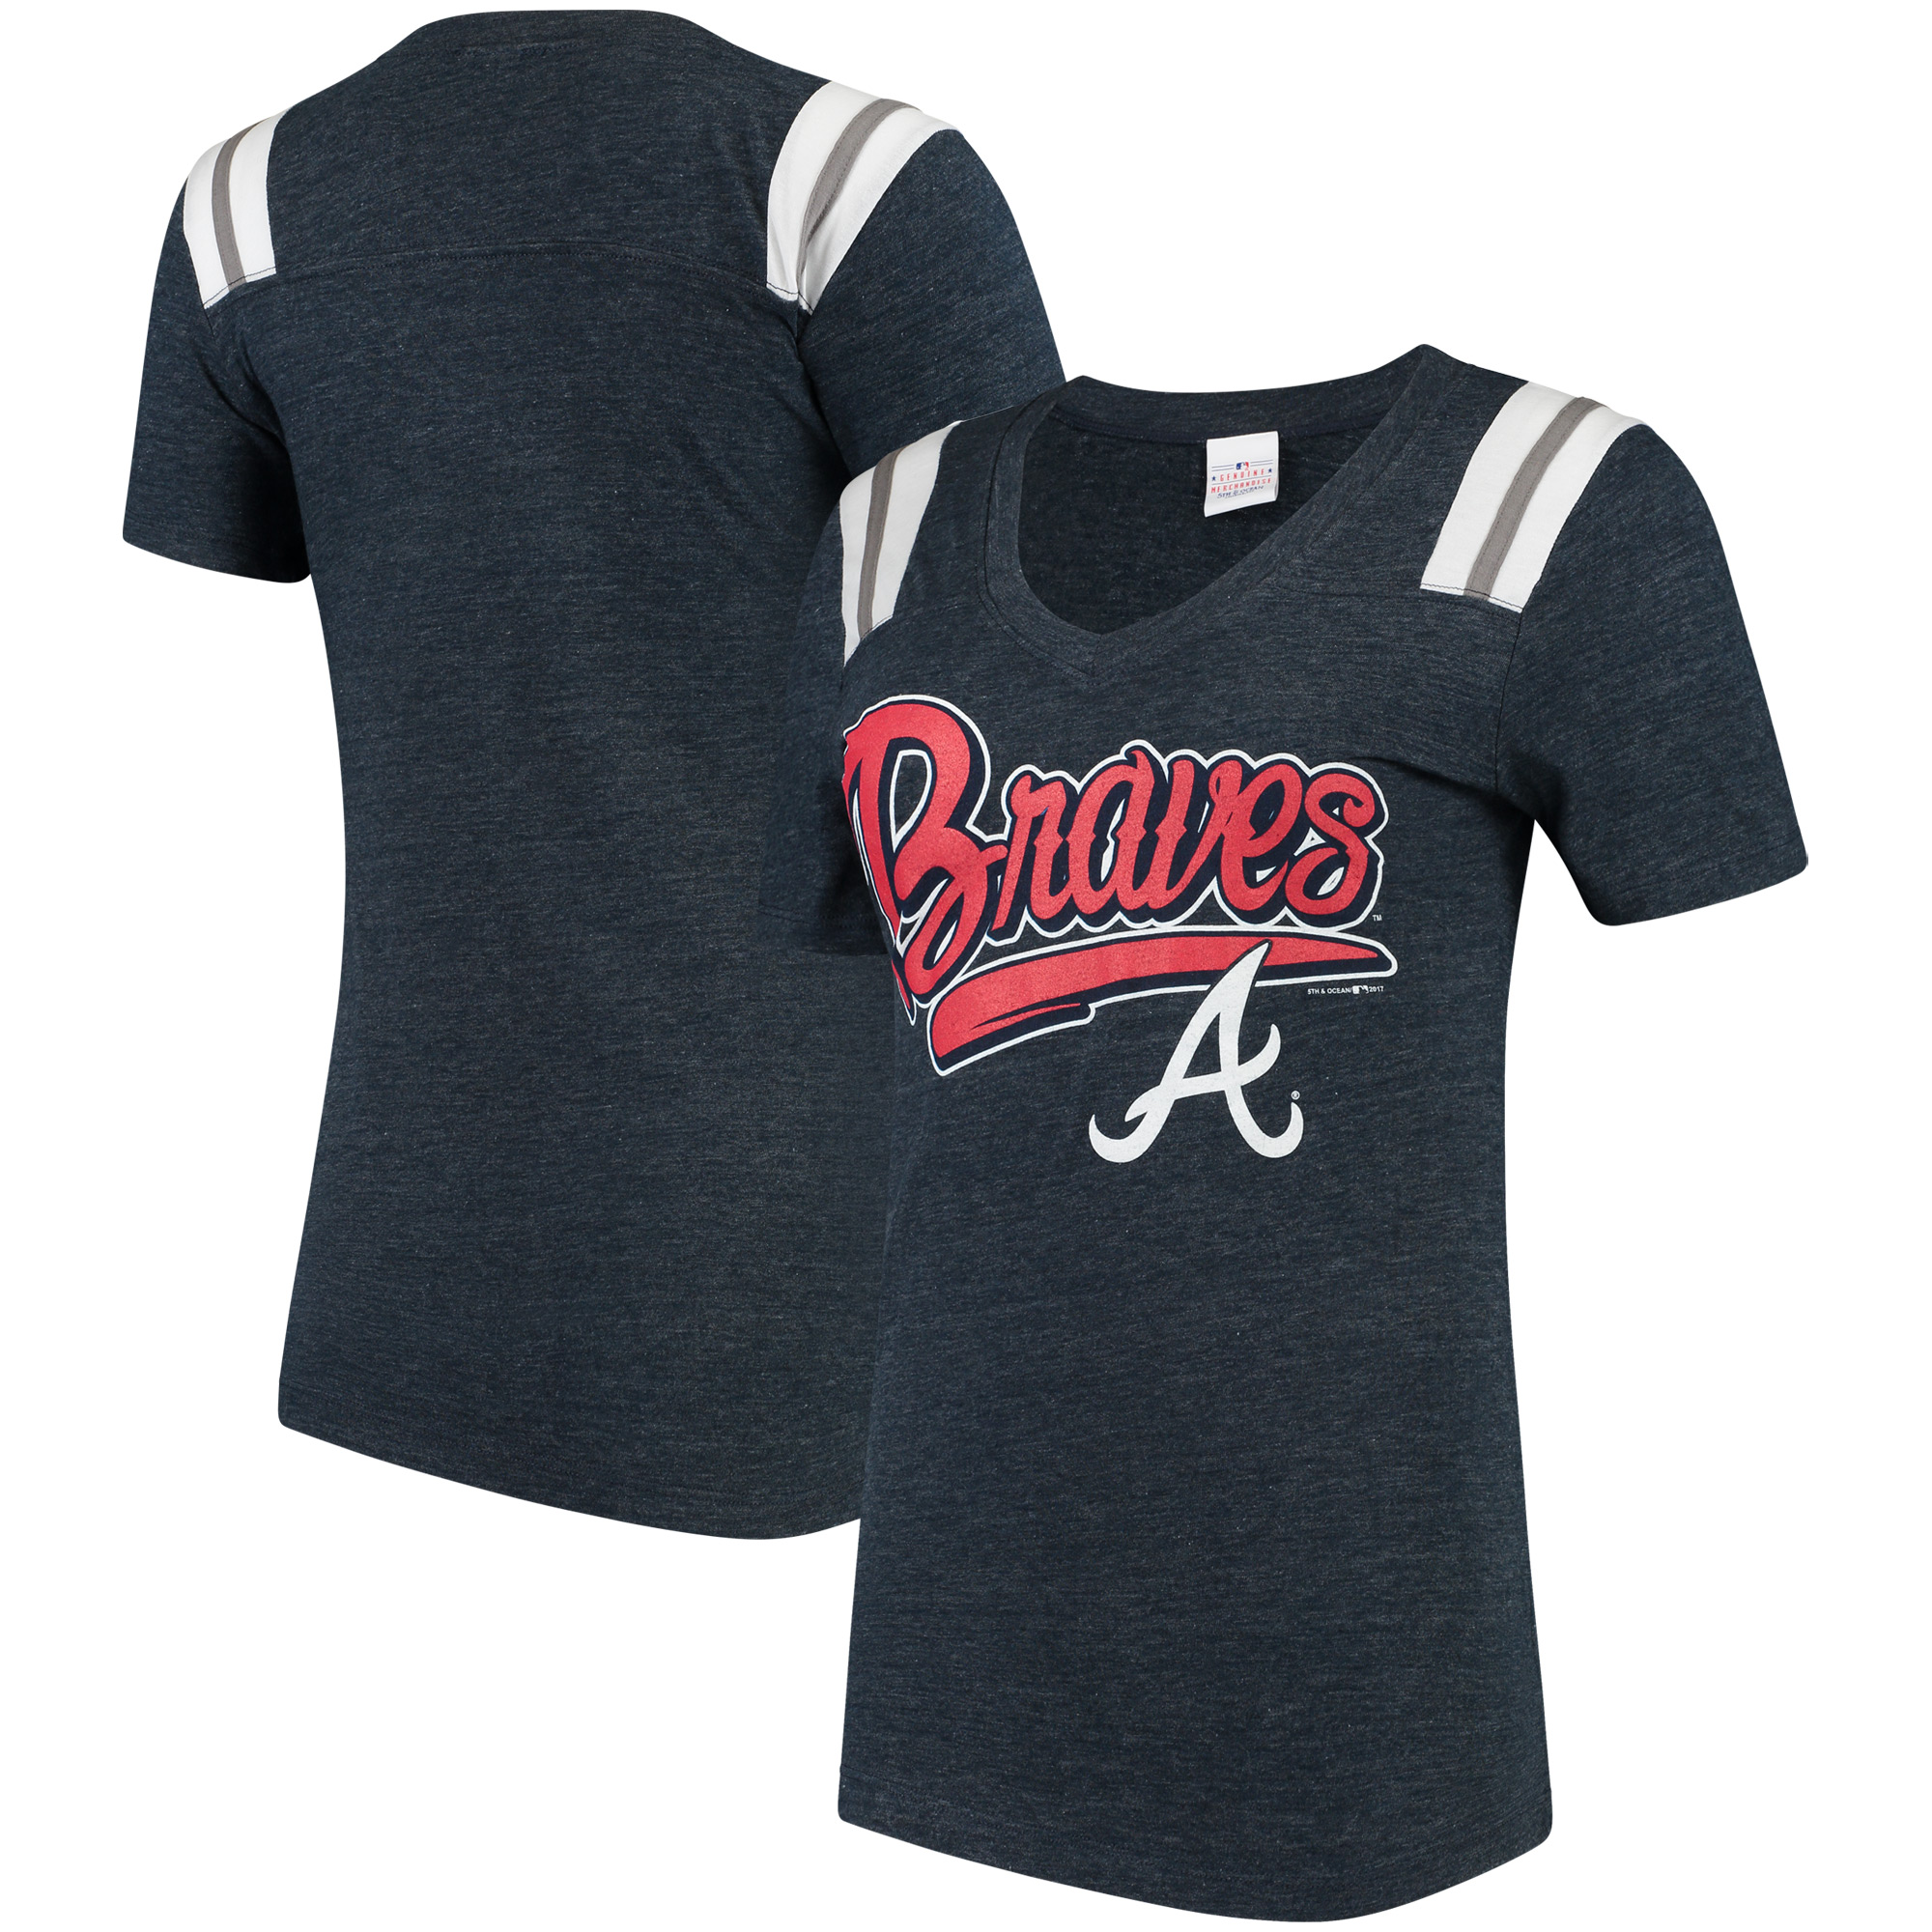 Atlanta Braves 5th & Ocean by New Era Women's Tri-Blend V-Neck T-Shirt with Shoulder Inserts - Navy/White